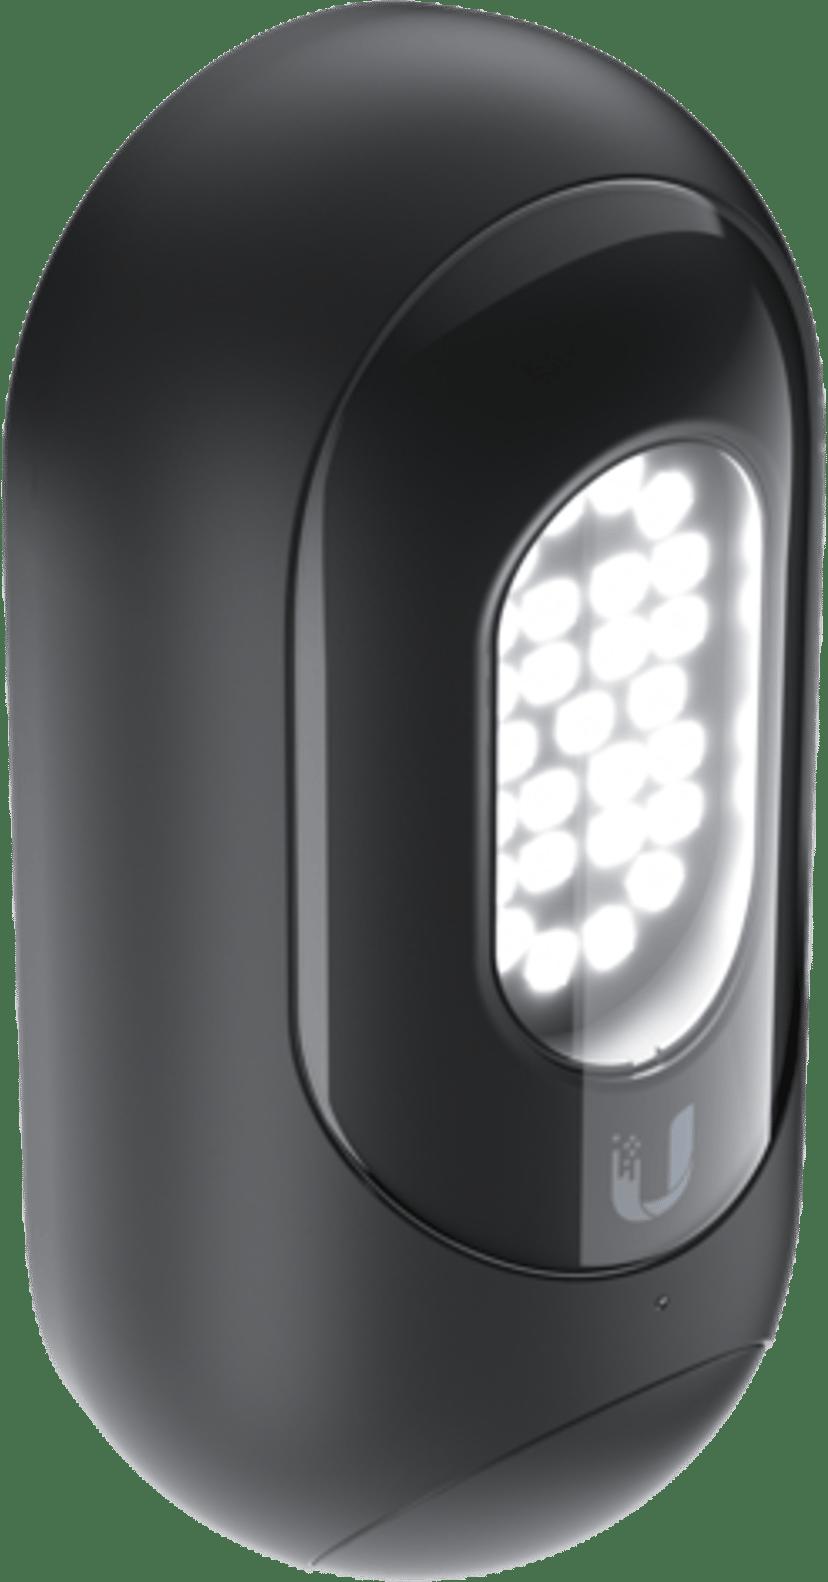 Ubiquiti UniFi Protect Smart Flood Light